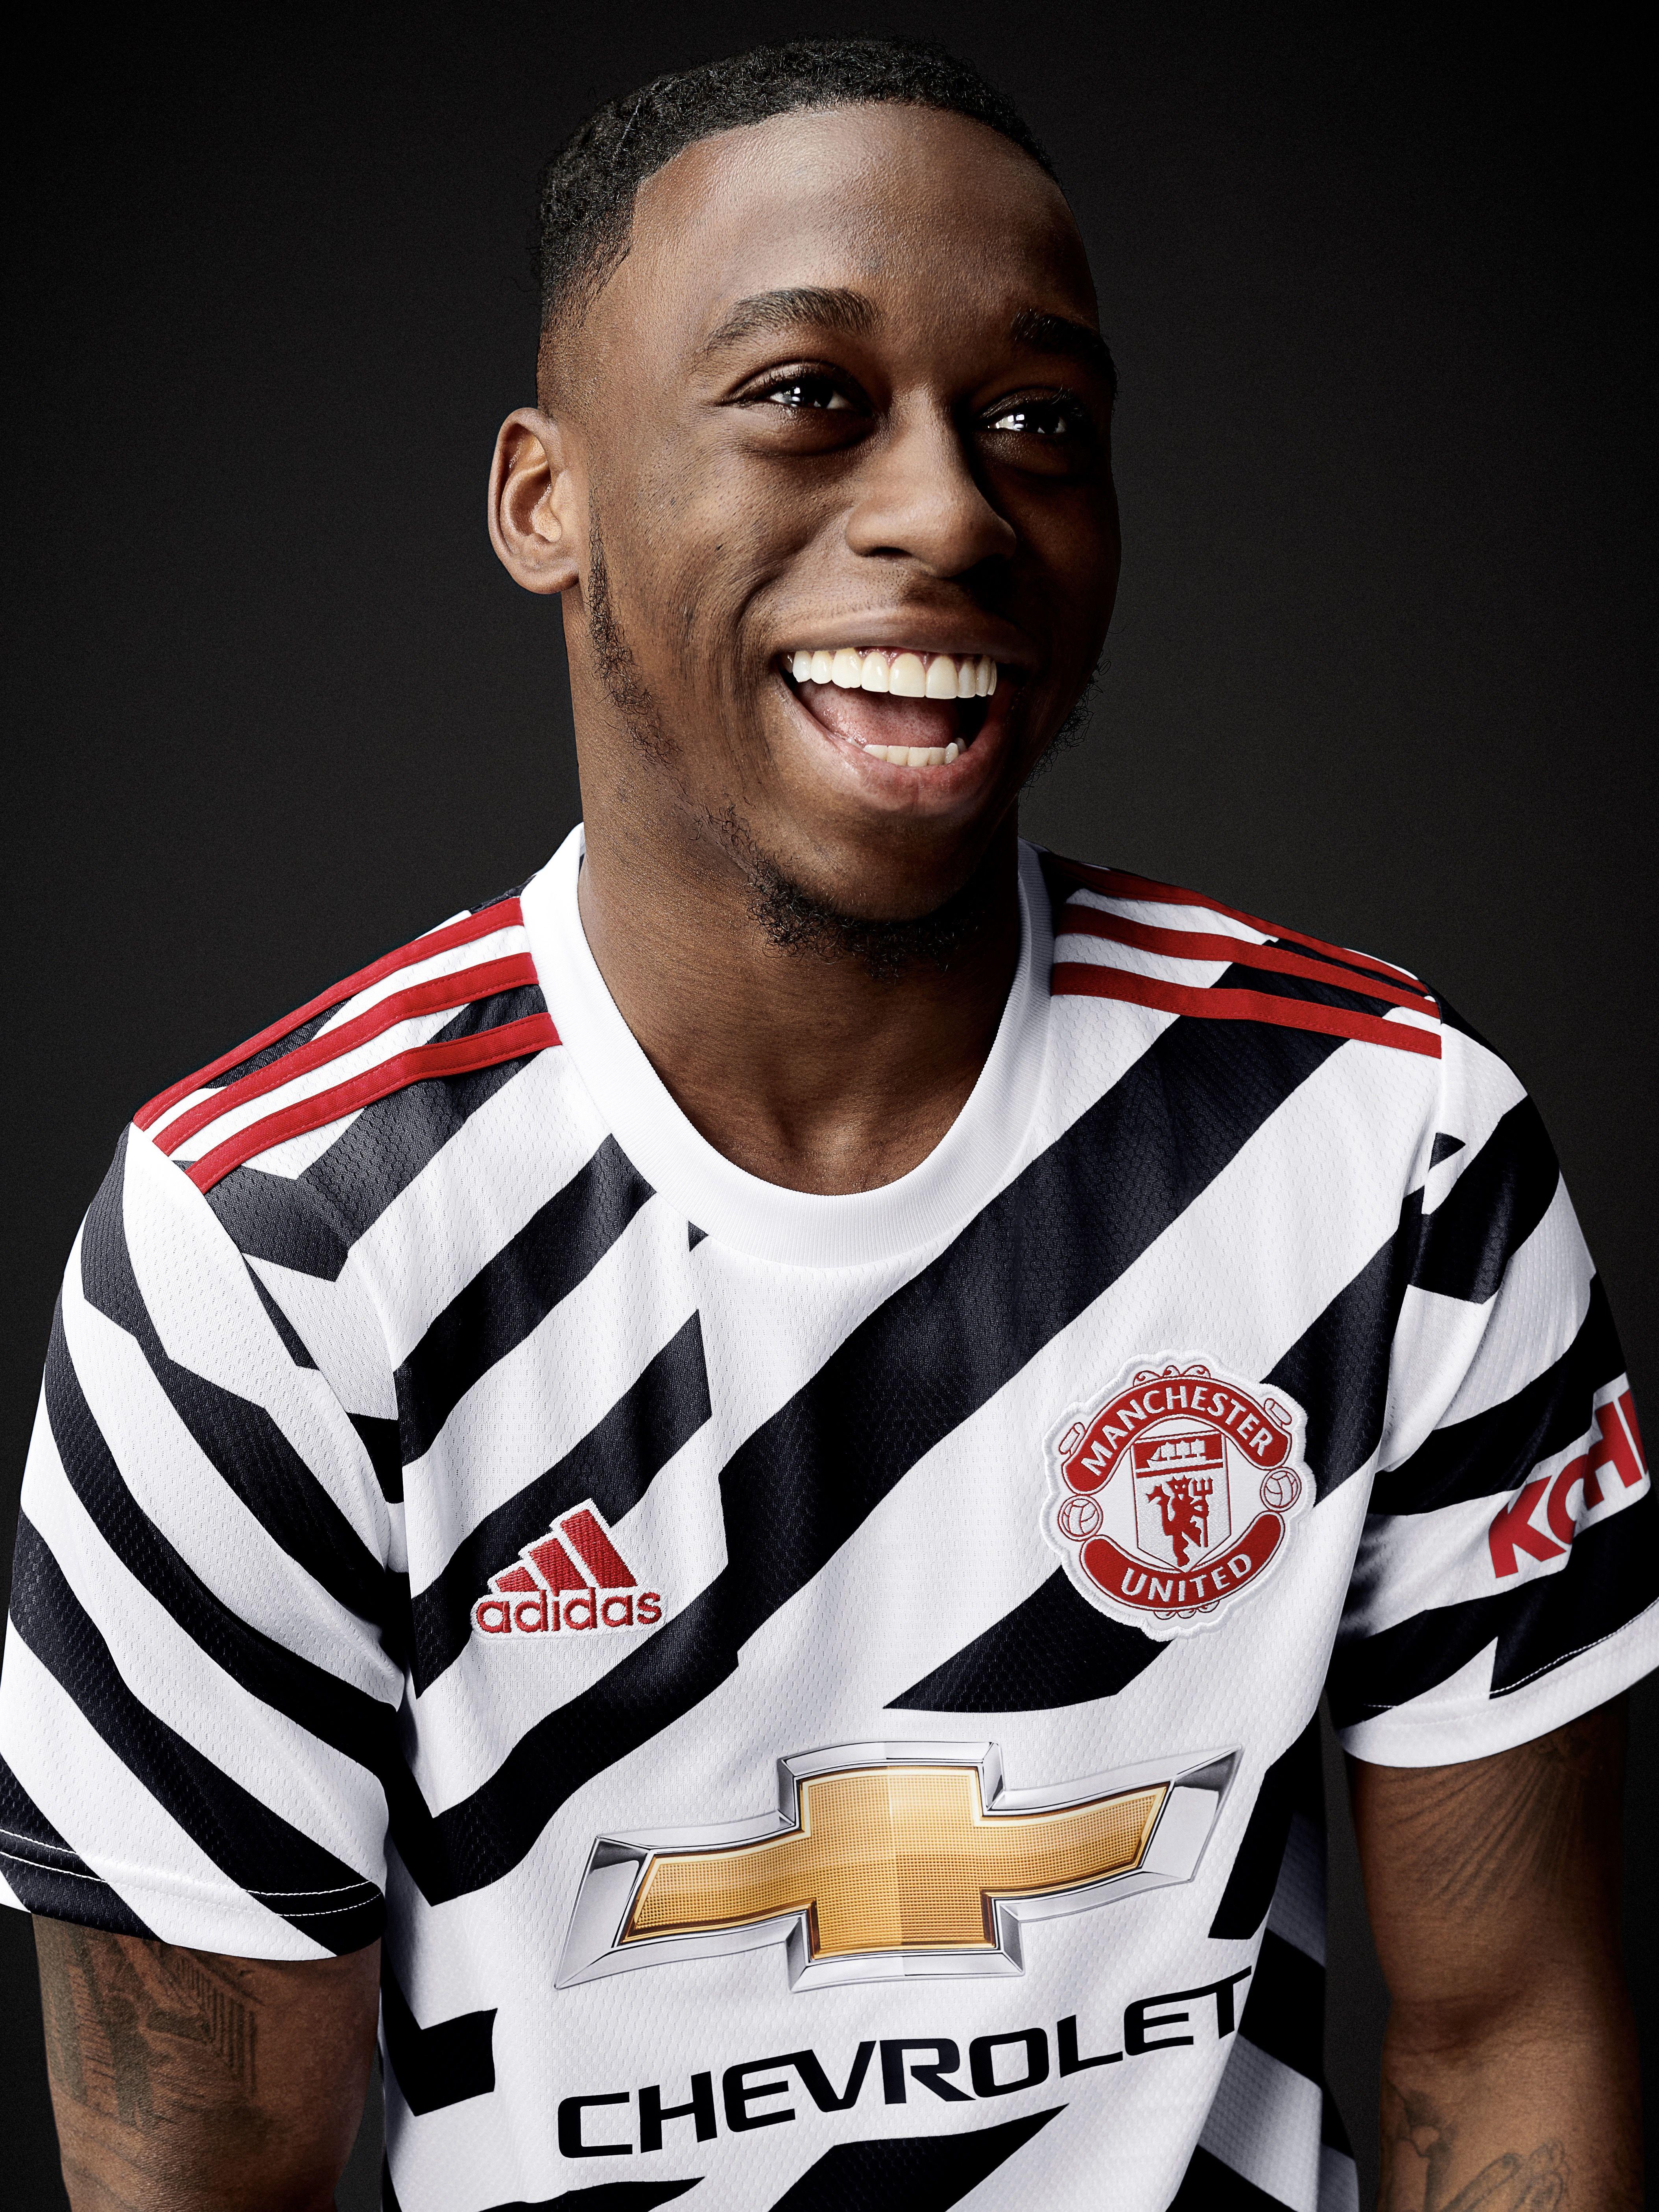 Manchester United Jerseys Apparel Gear Manchester United Third Kit Manchester United Manchester United Wallpaper